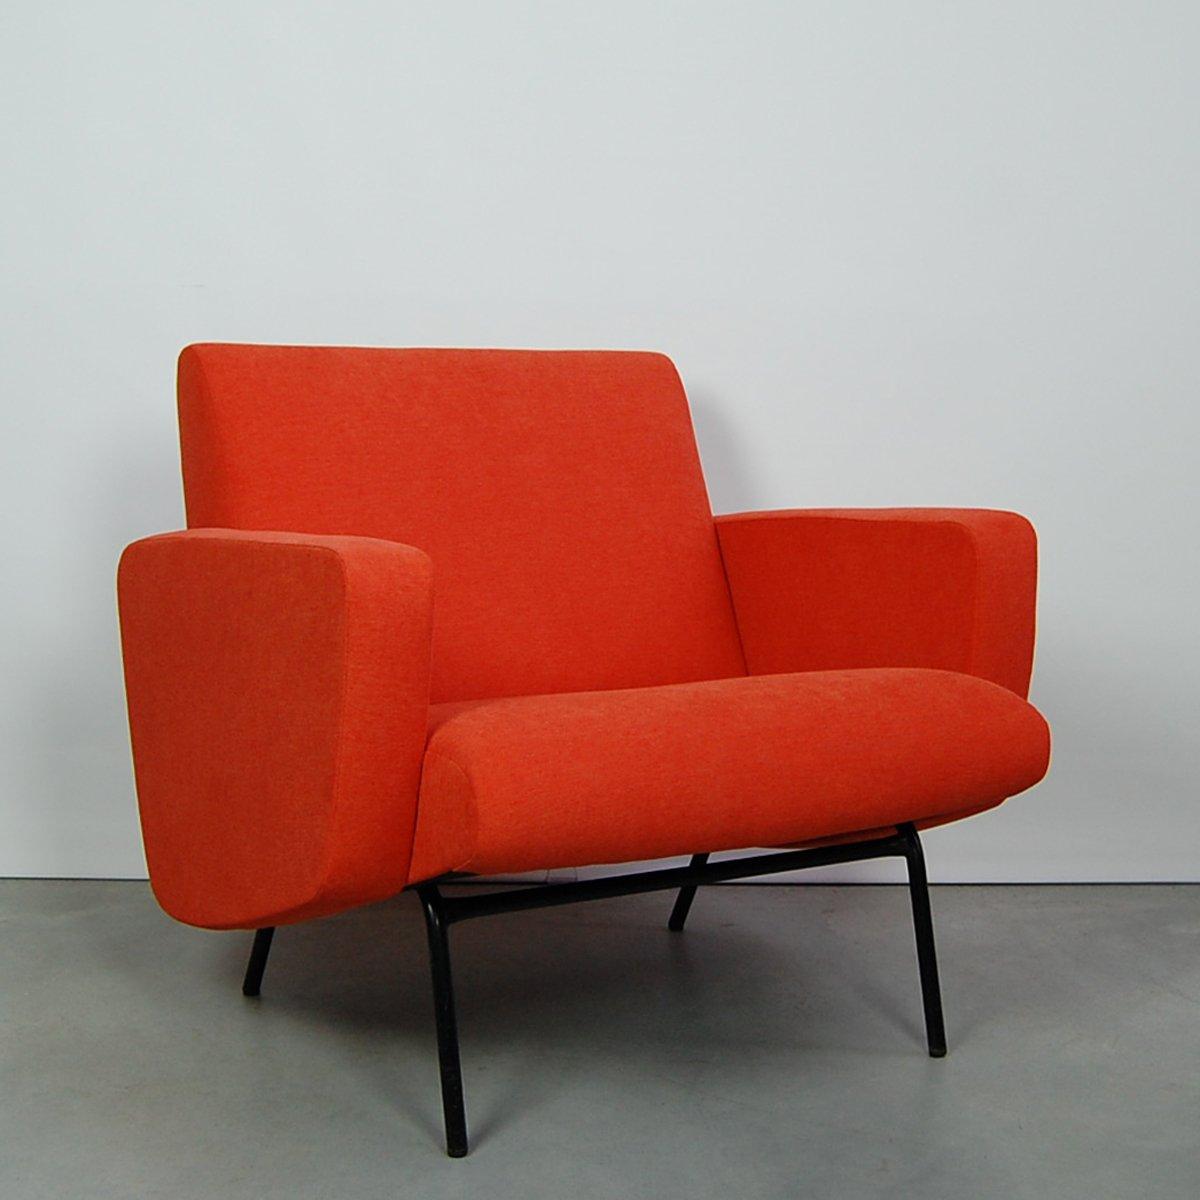 mid century breda sessel von pierre guariche f r meurop 1960er cafe konrad vib. Black Bedroom Furniture Sets. Home Design Ideas